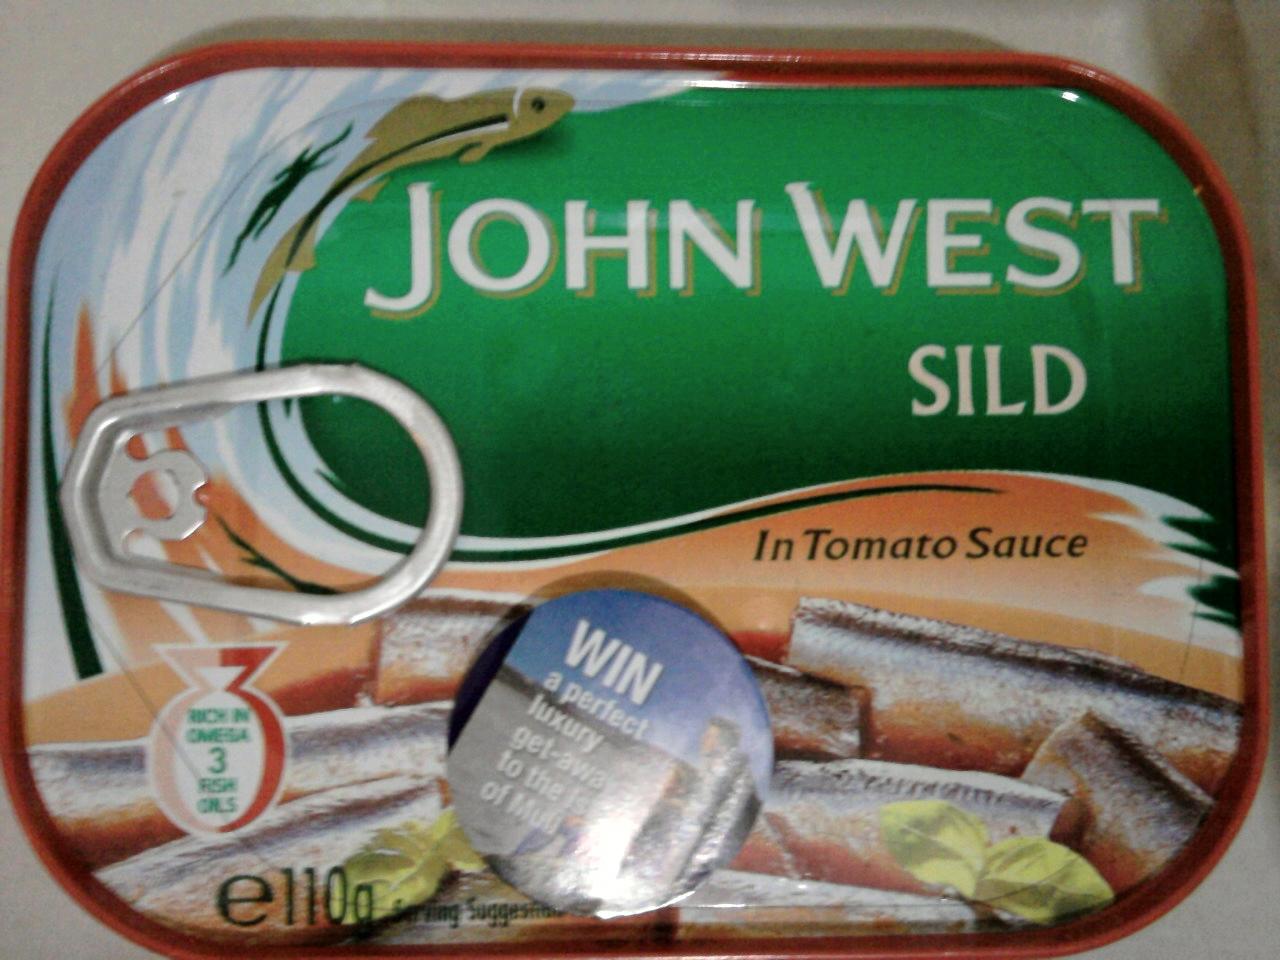 John West Sild In Tomato Sauce front of tin